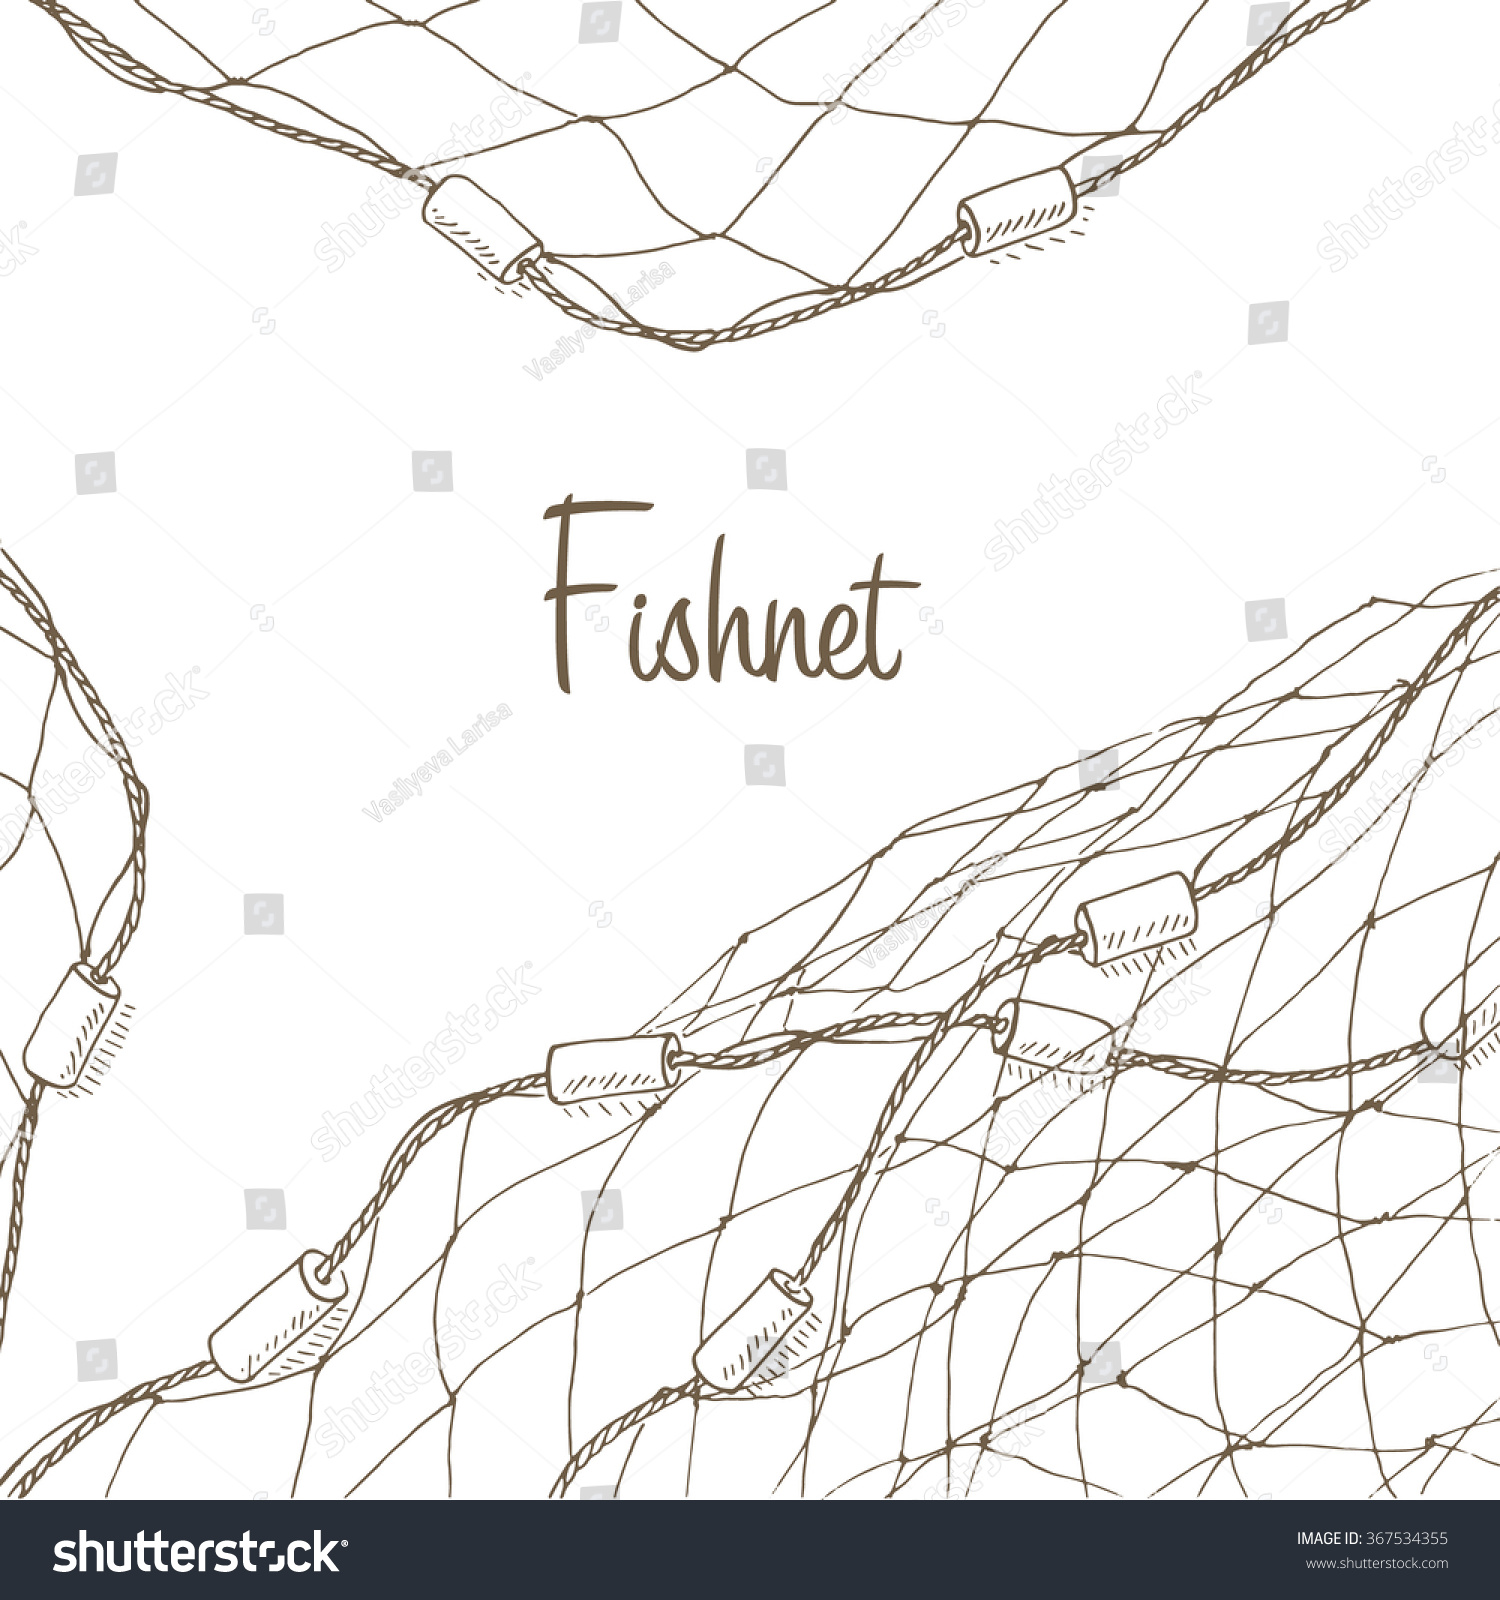 fishing net vector - photo #20